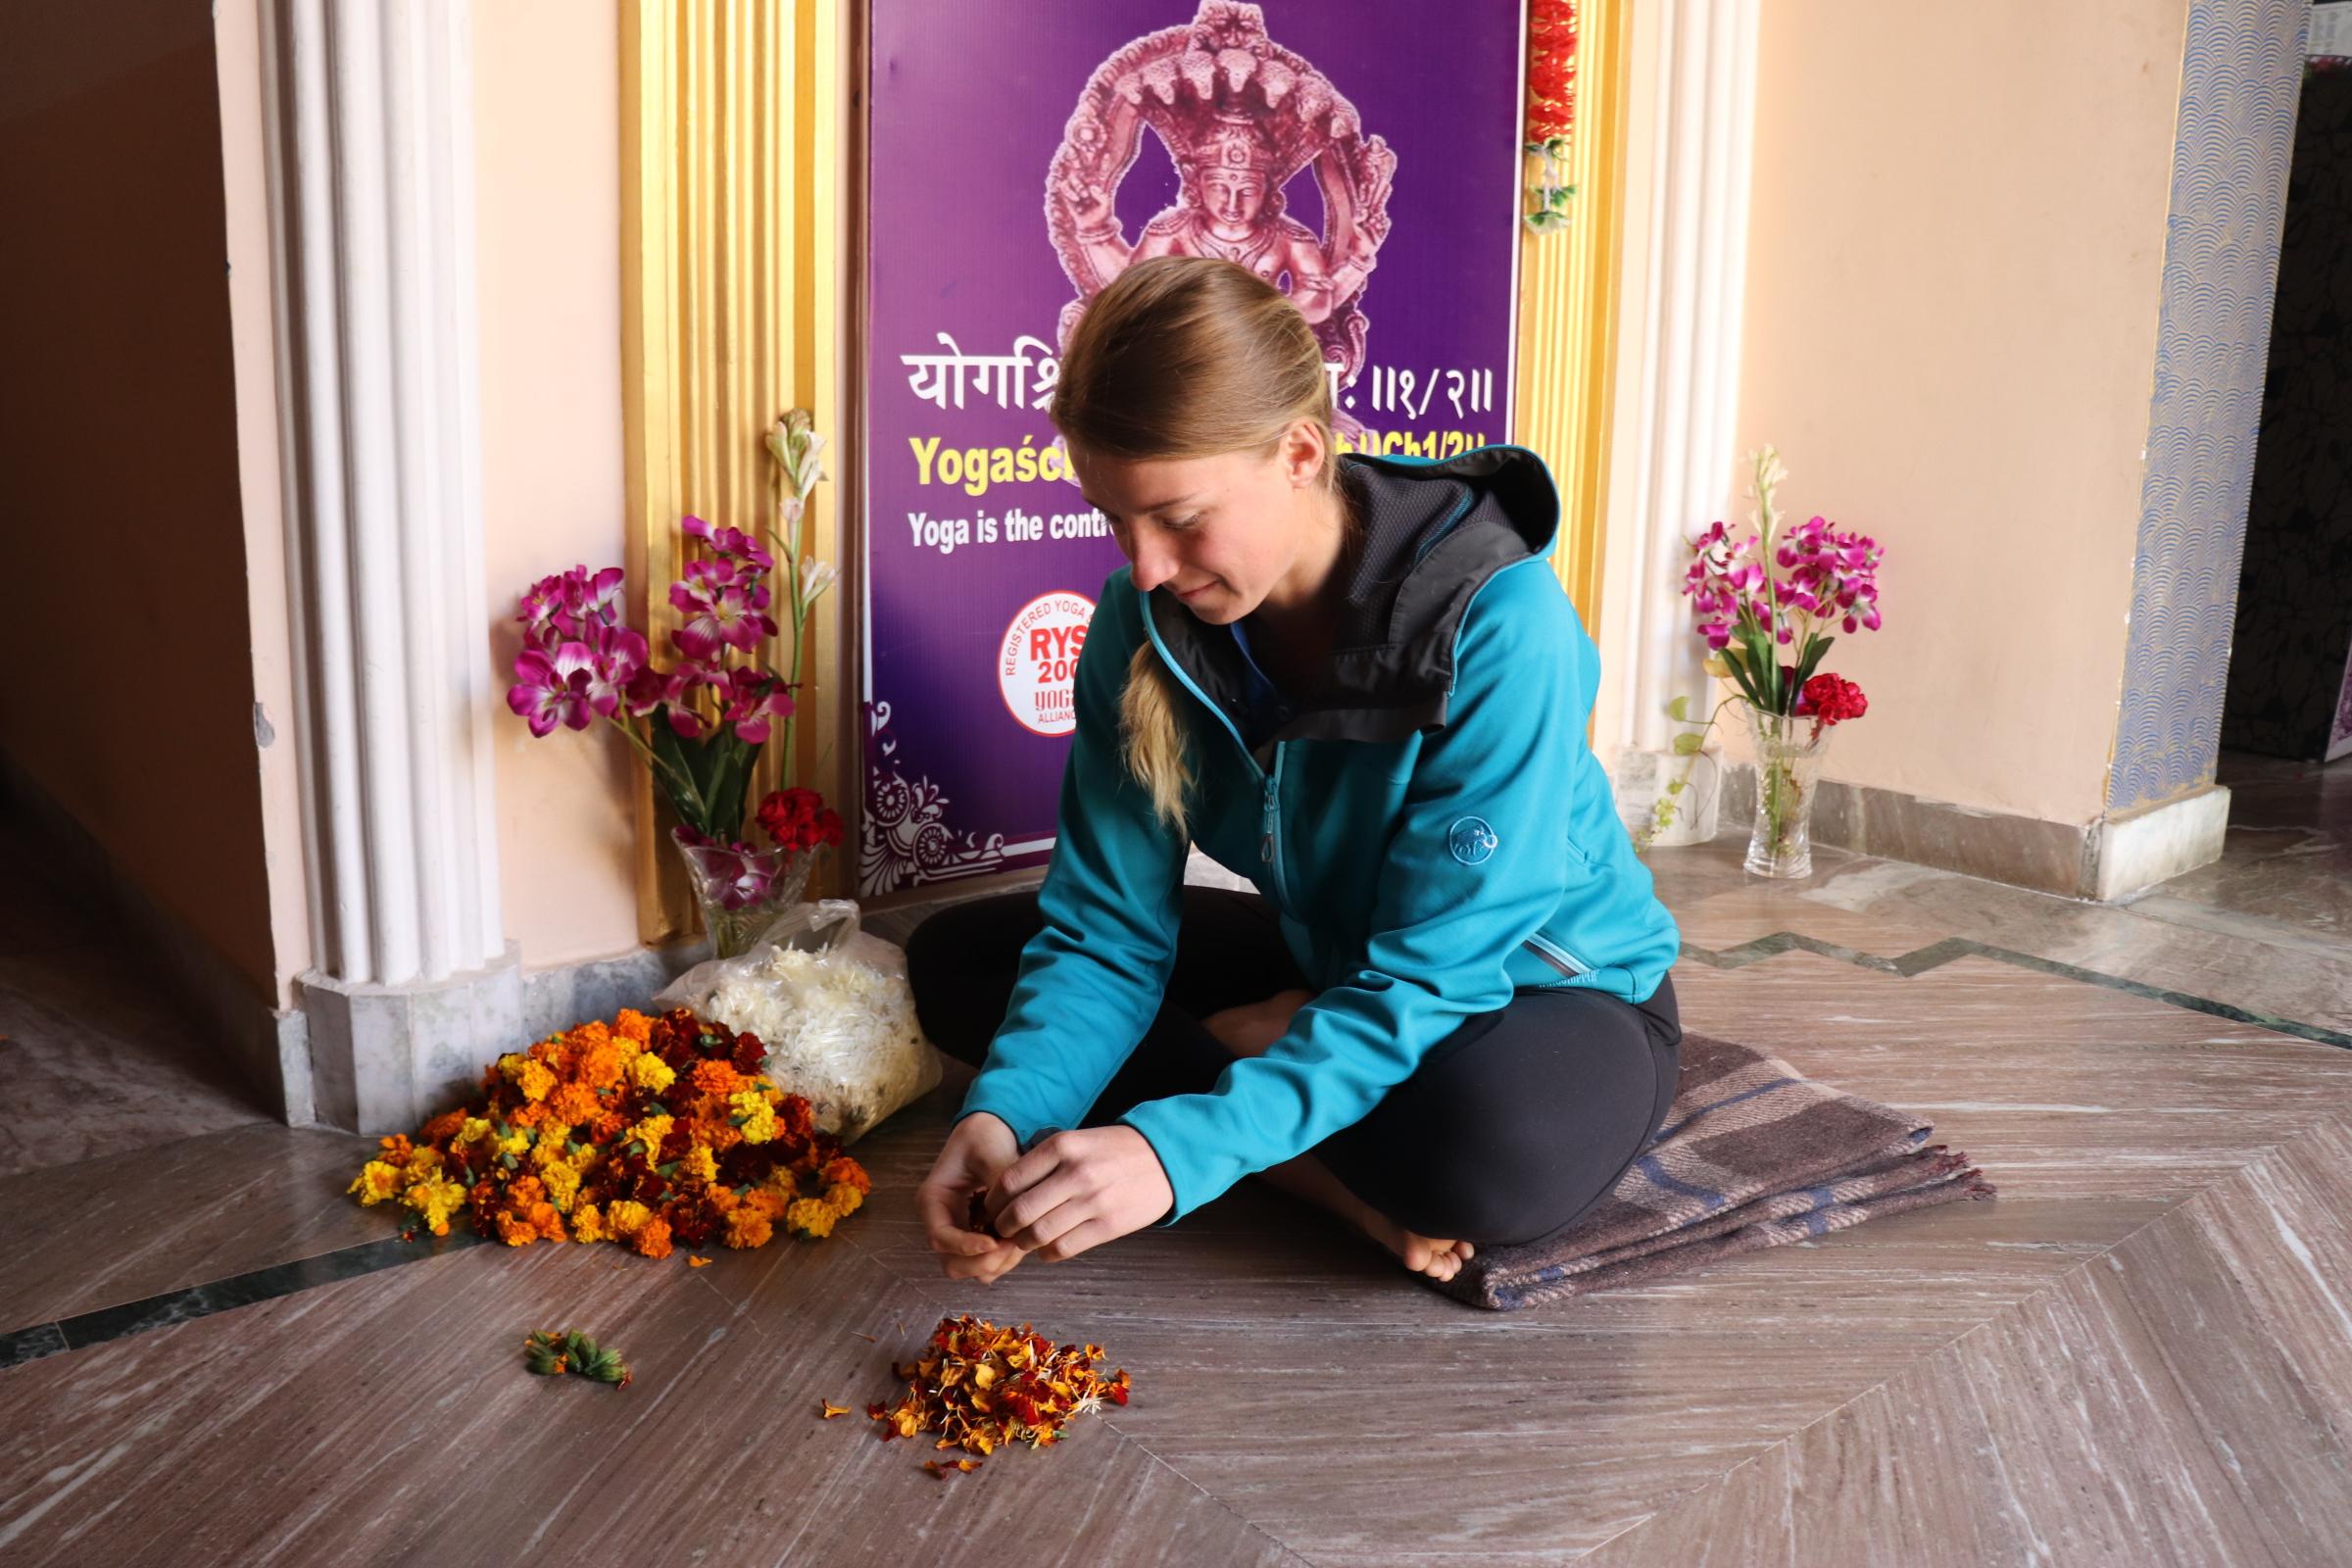 Hari Om Yoga vidya school-SchoSys.com